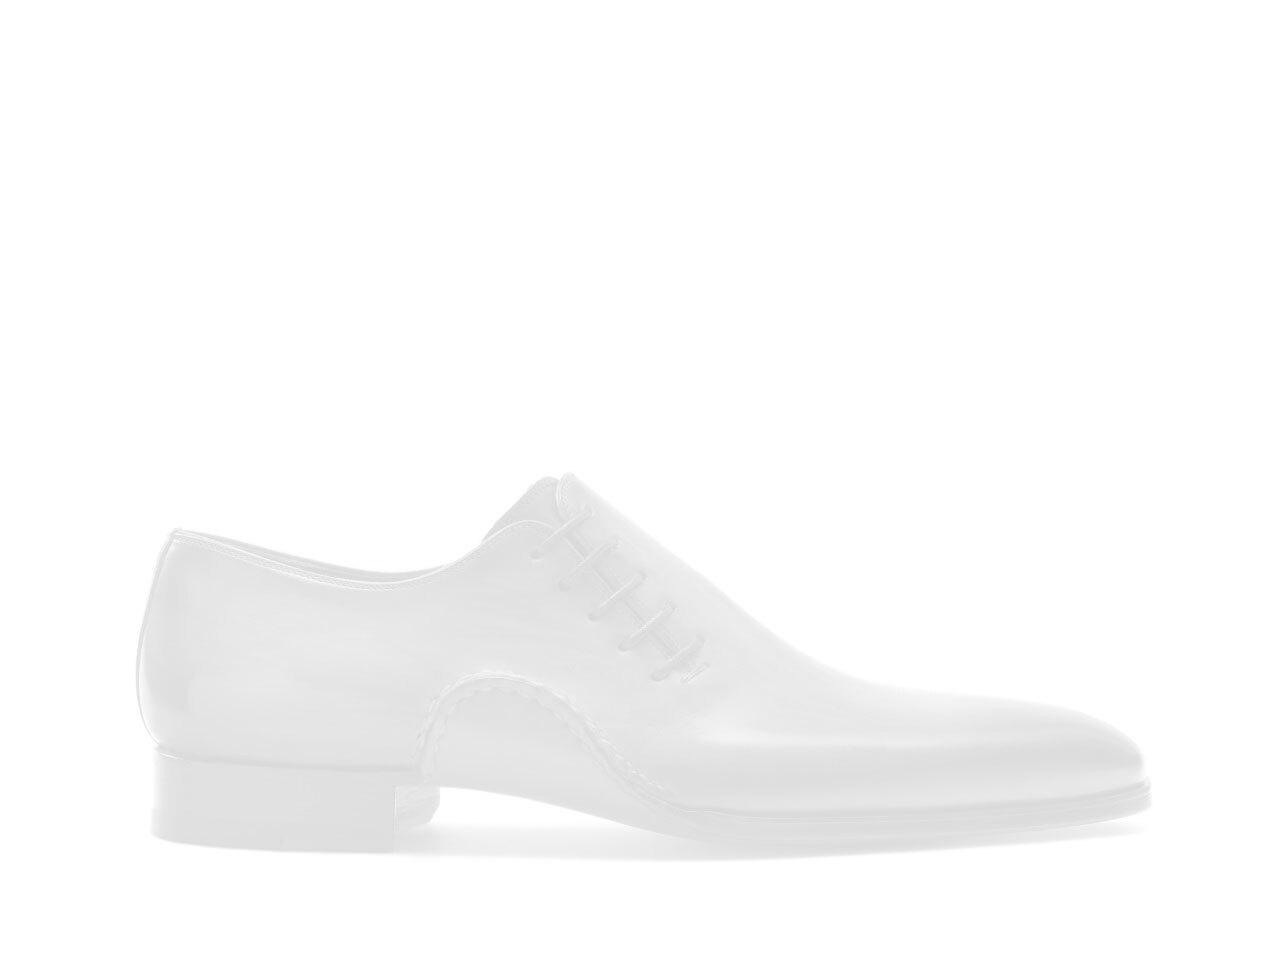 Pair of the Magnanni Playa Perf Cognac Men's Sandal Slides